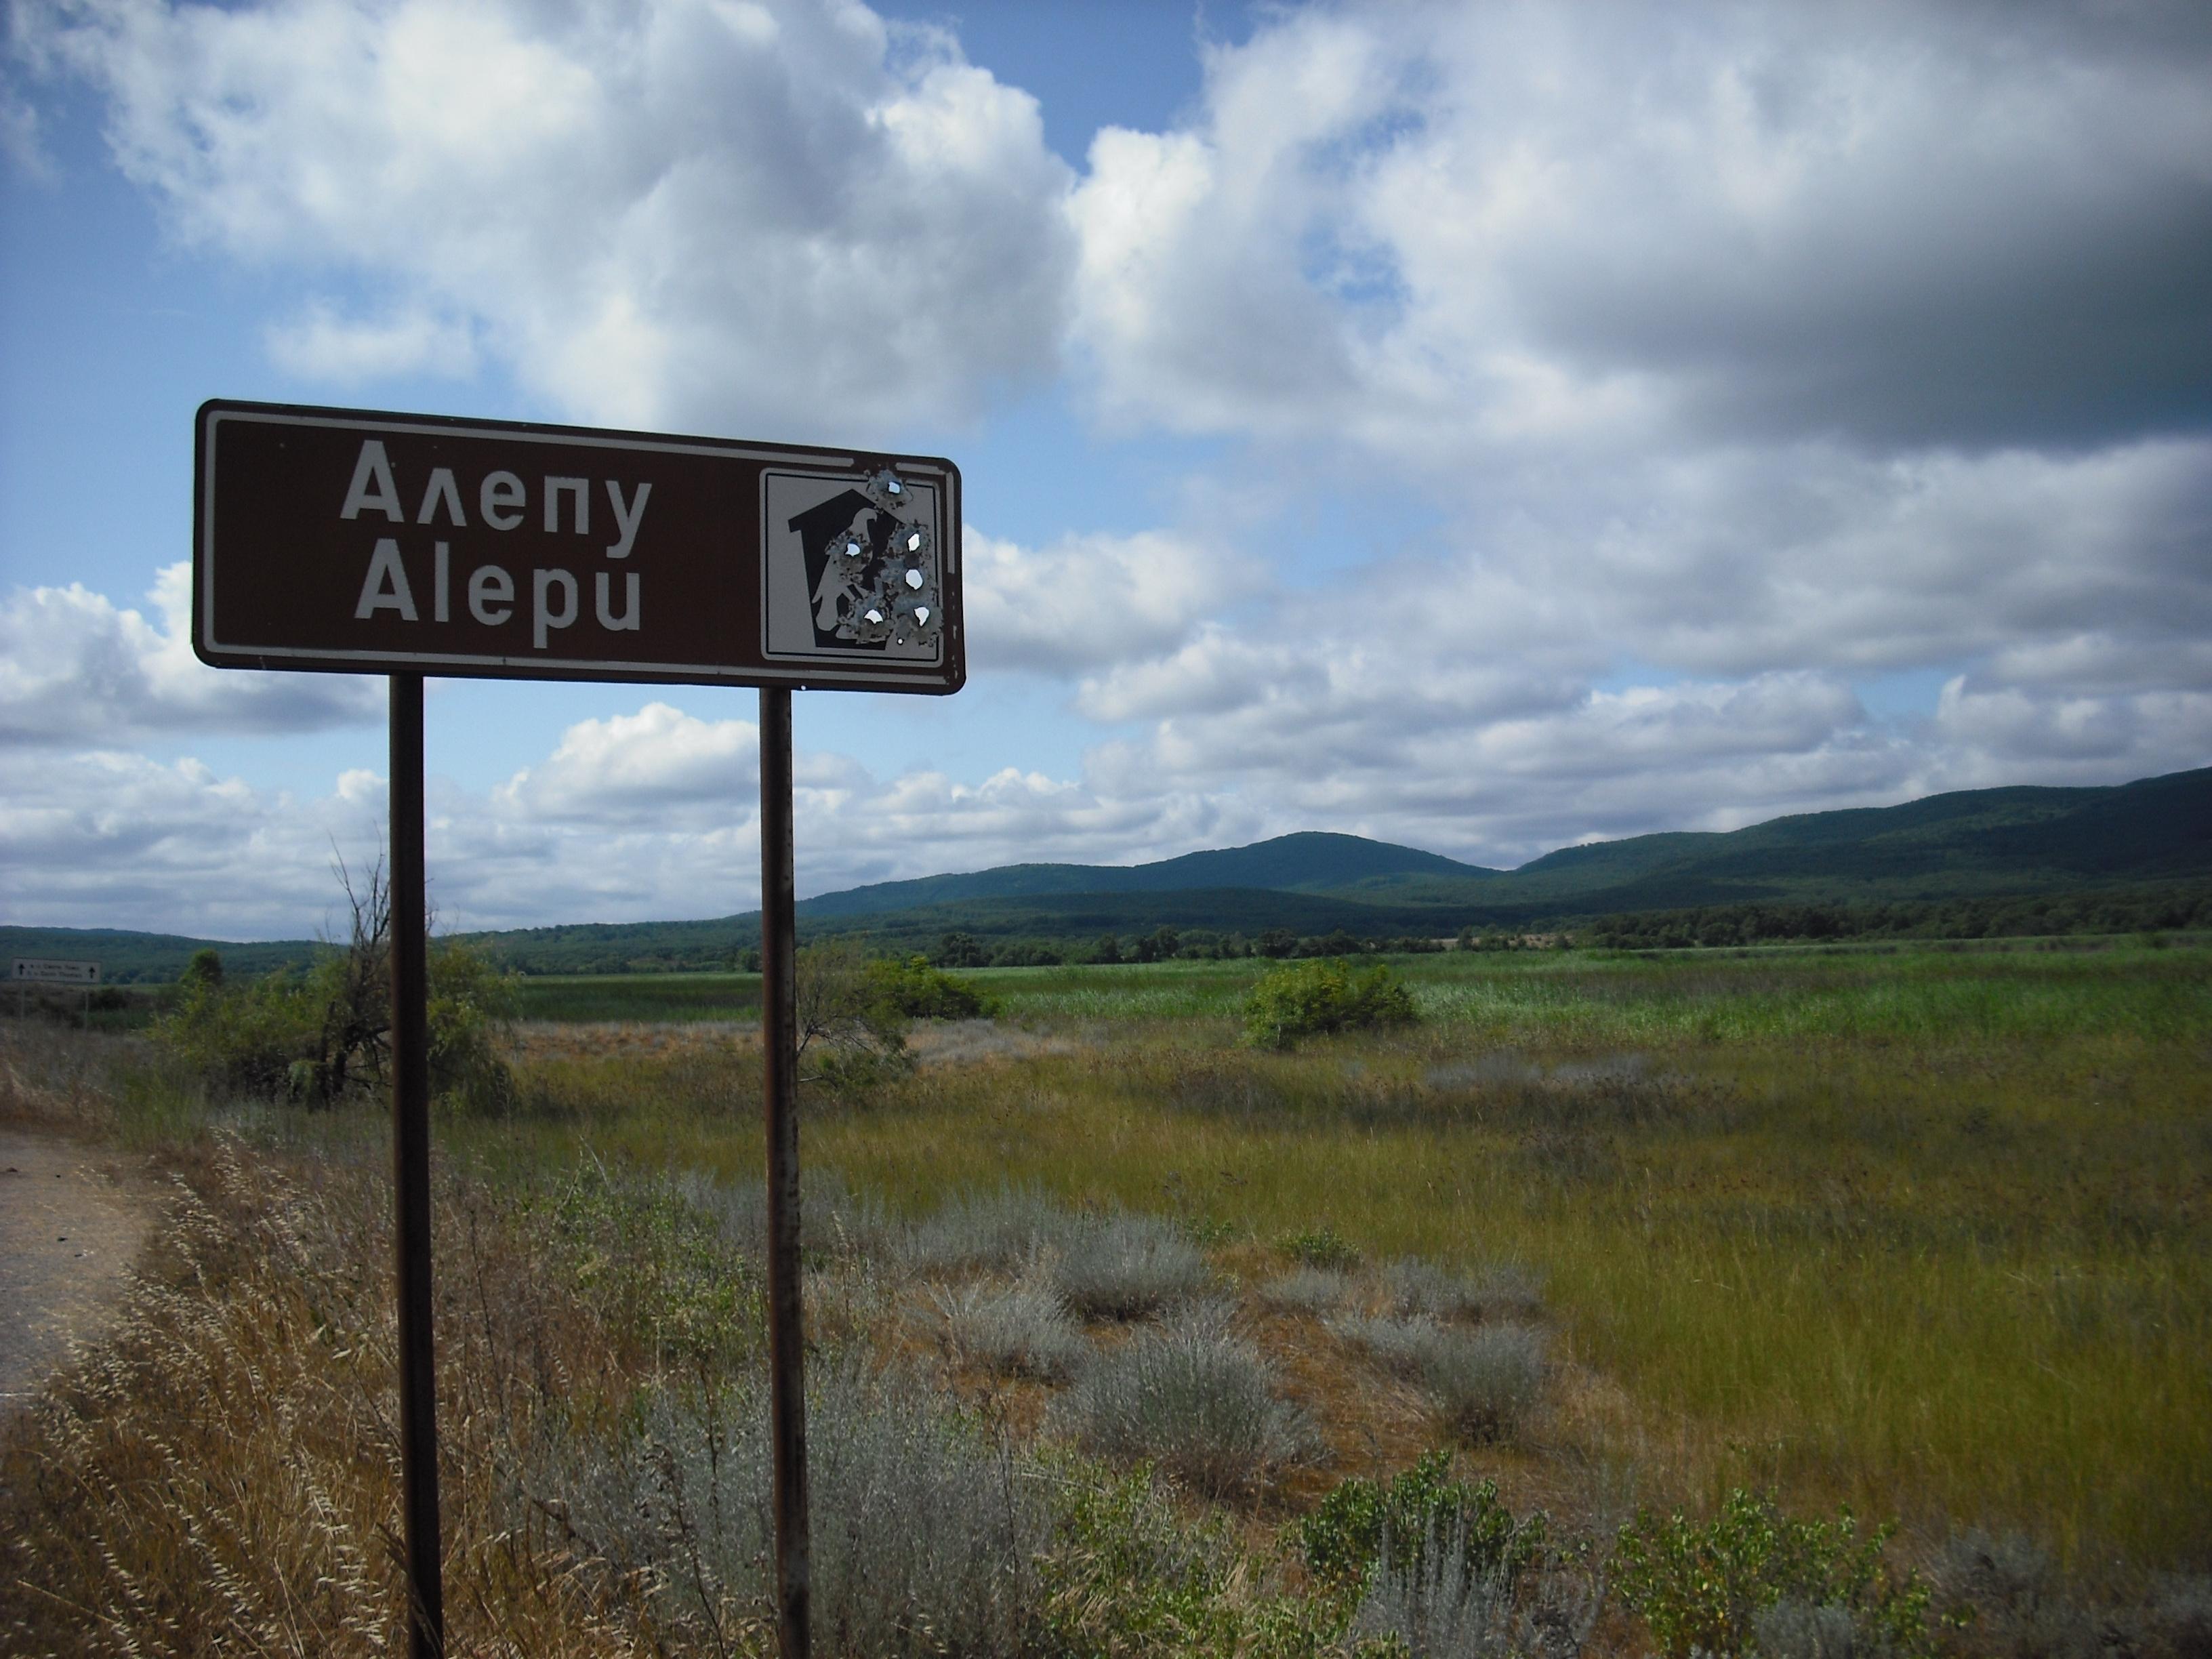 Косово, / земјо обеќана..... / Alepu_Nature_Reserve_Road_Sign_Bulgaria